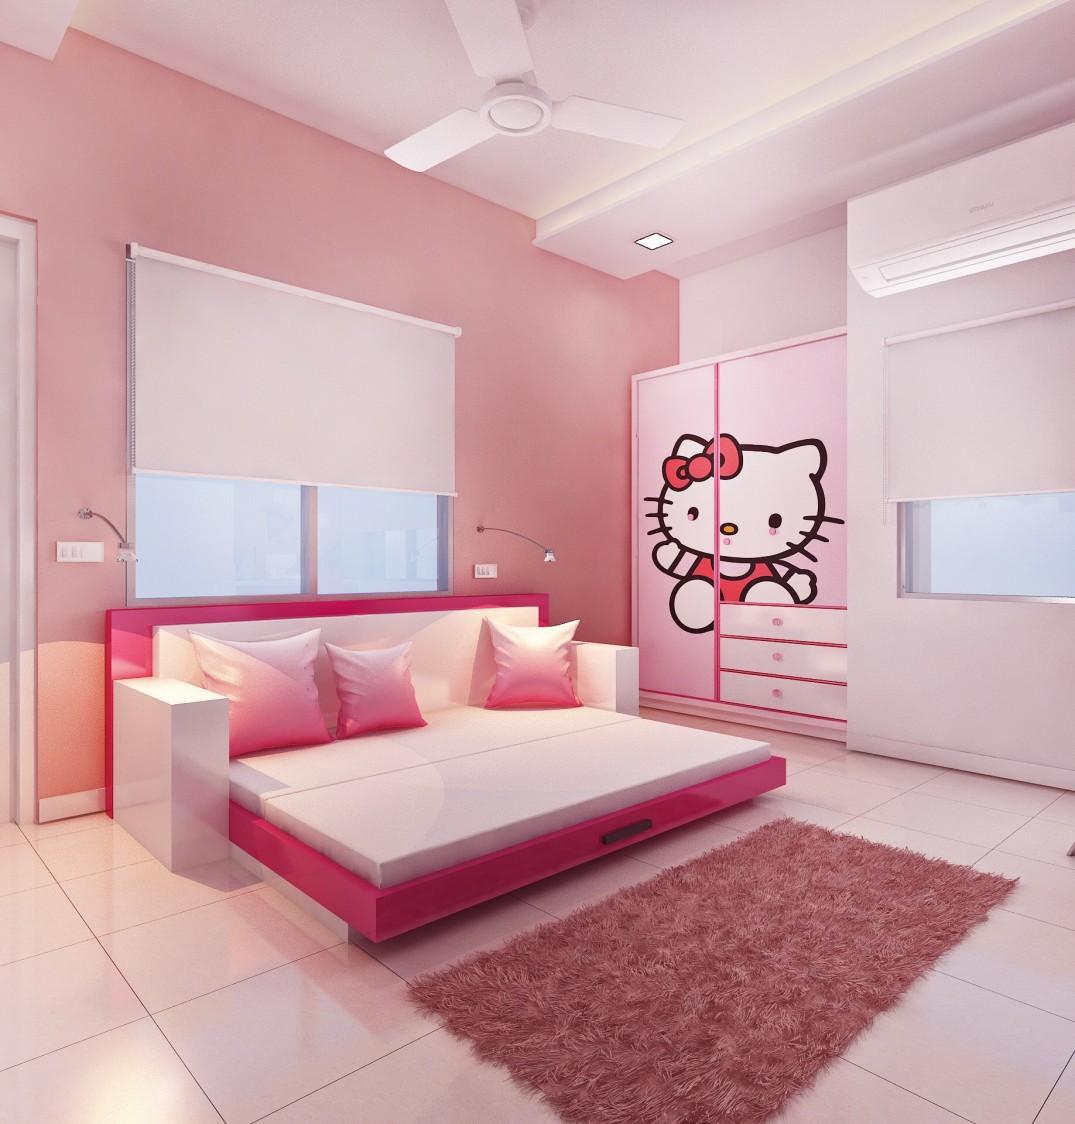 Pink Bedroom Design For Girls by setu.patel Bedroom   Interior Design Photos & Ideas